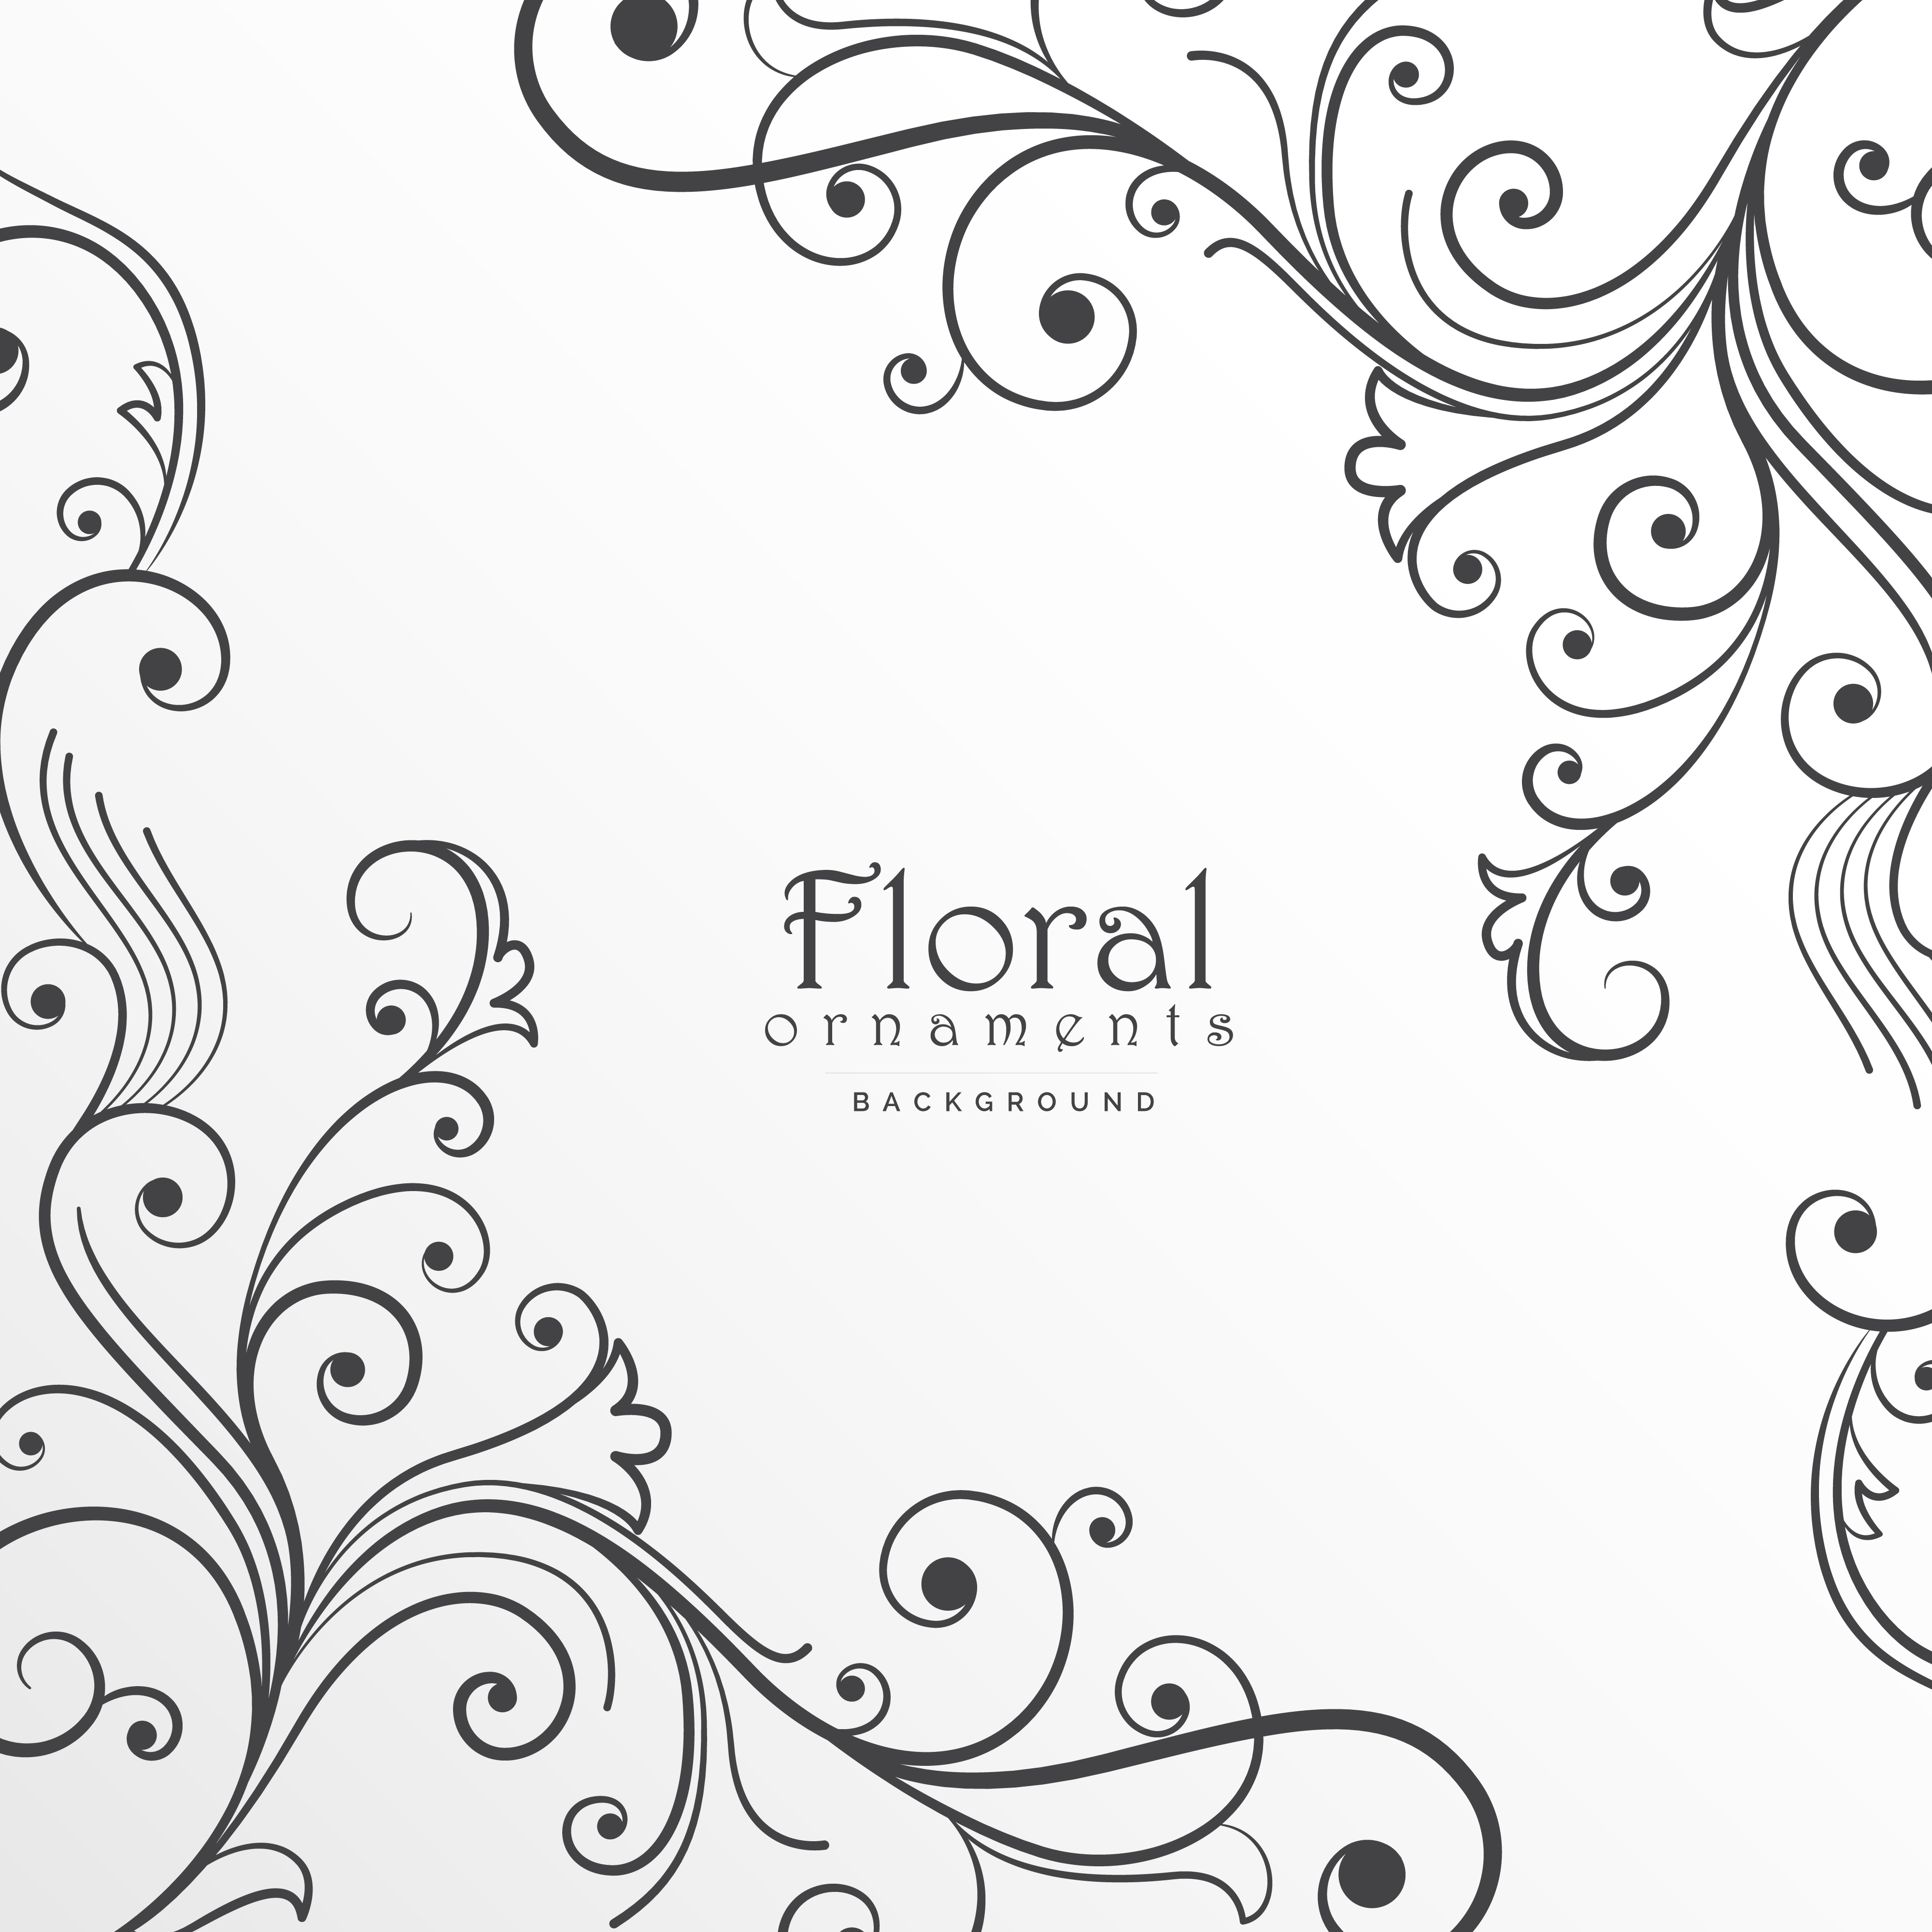 floral background design template  download free vector